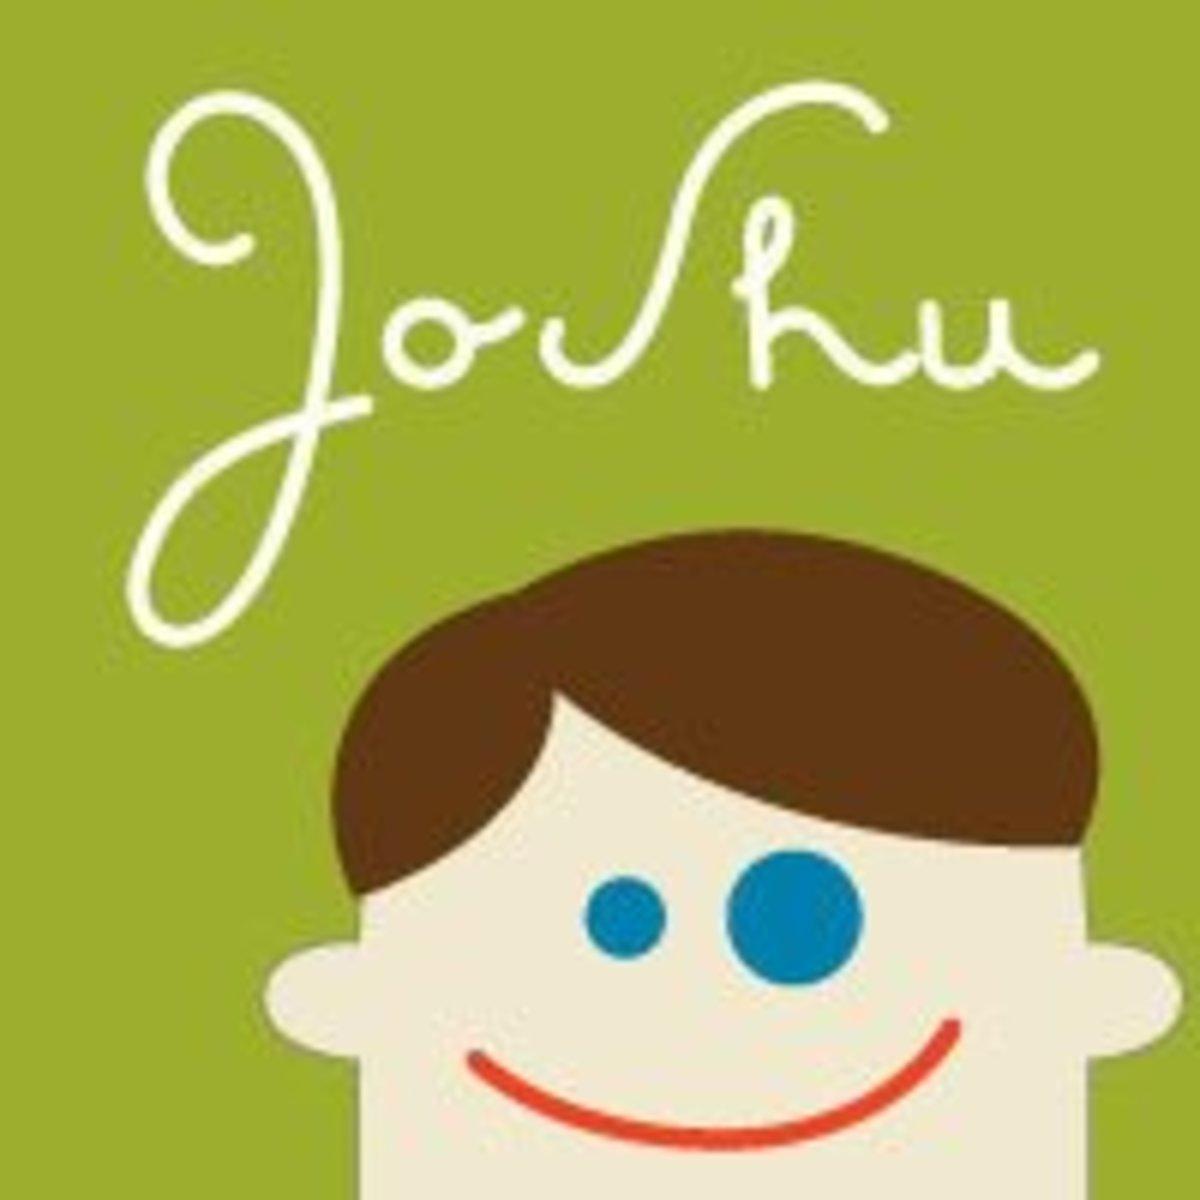 JoShu tee logo